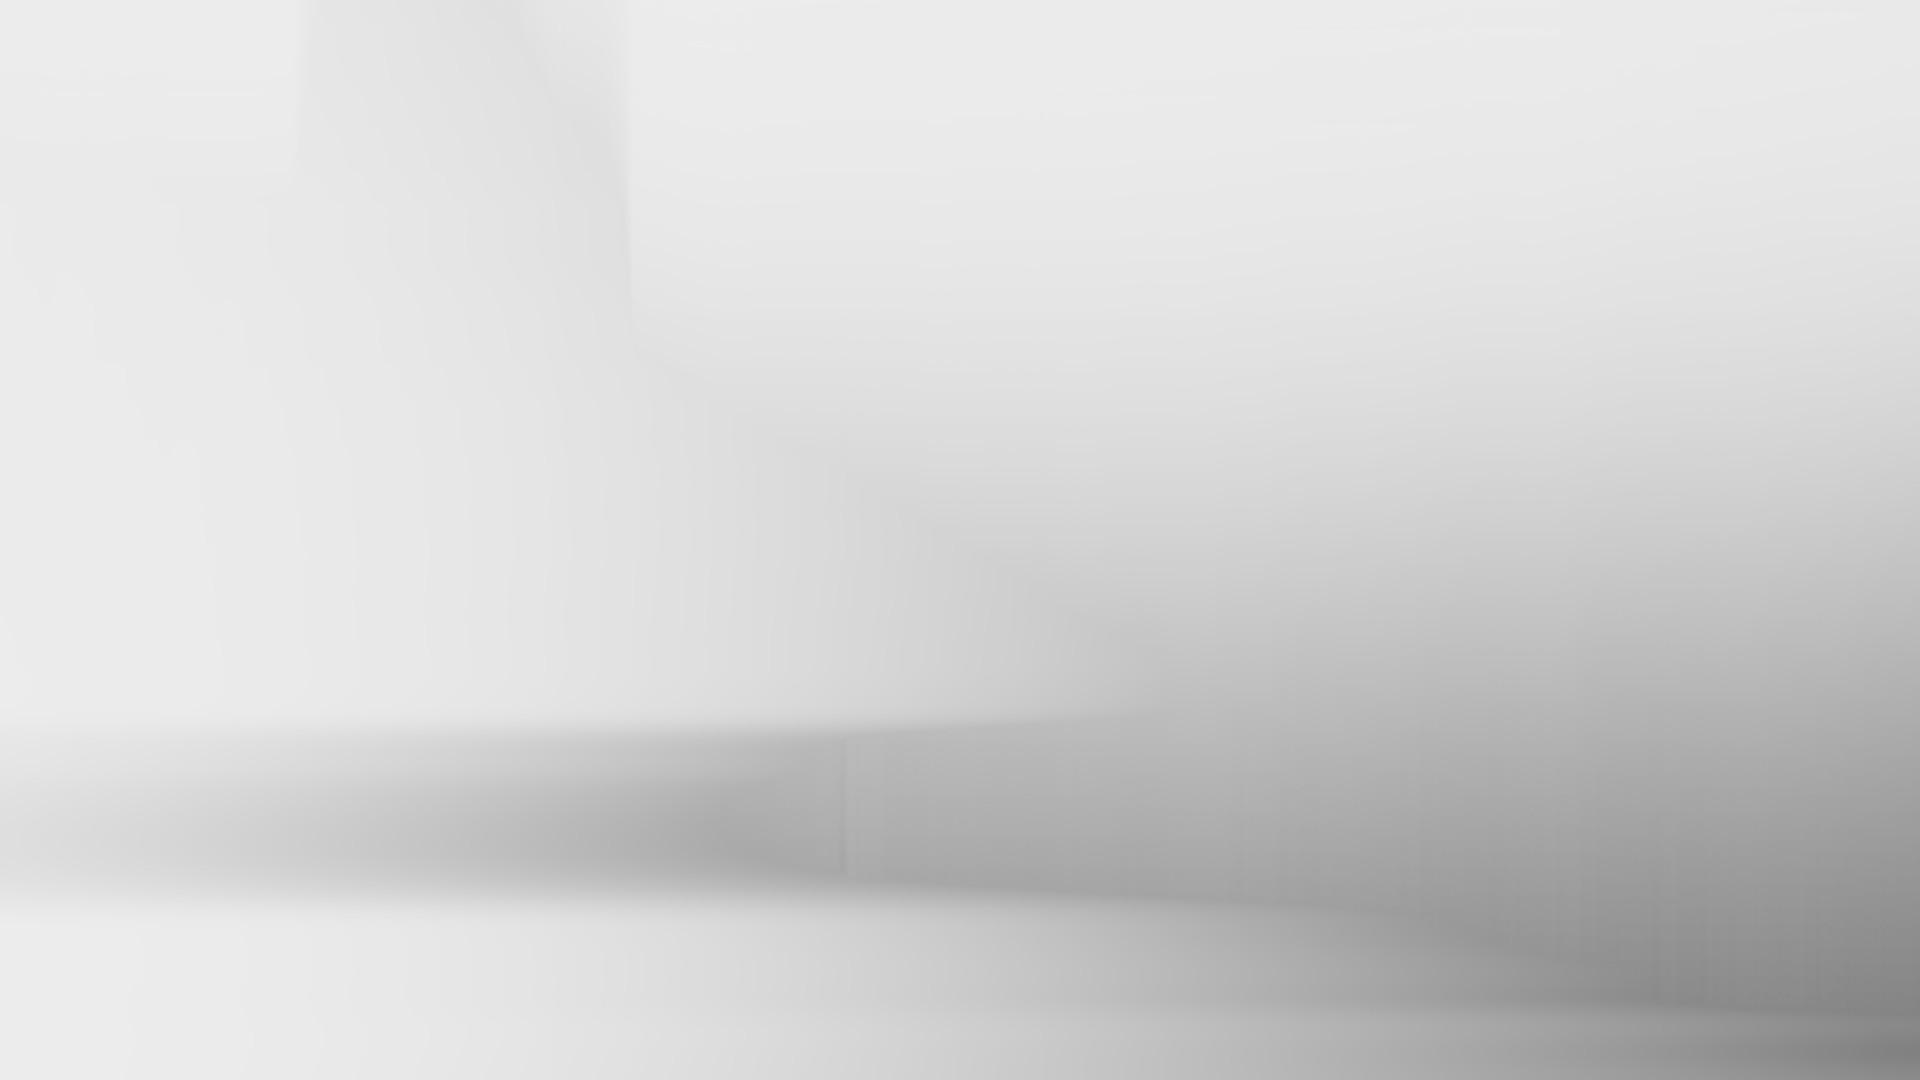 Silver background wallpaper wallpapersafari for White 3d wallpaper